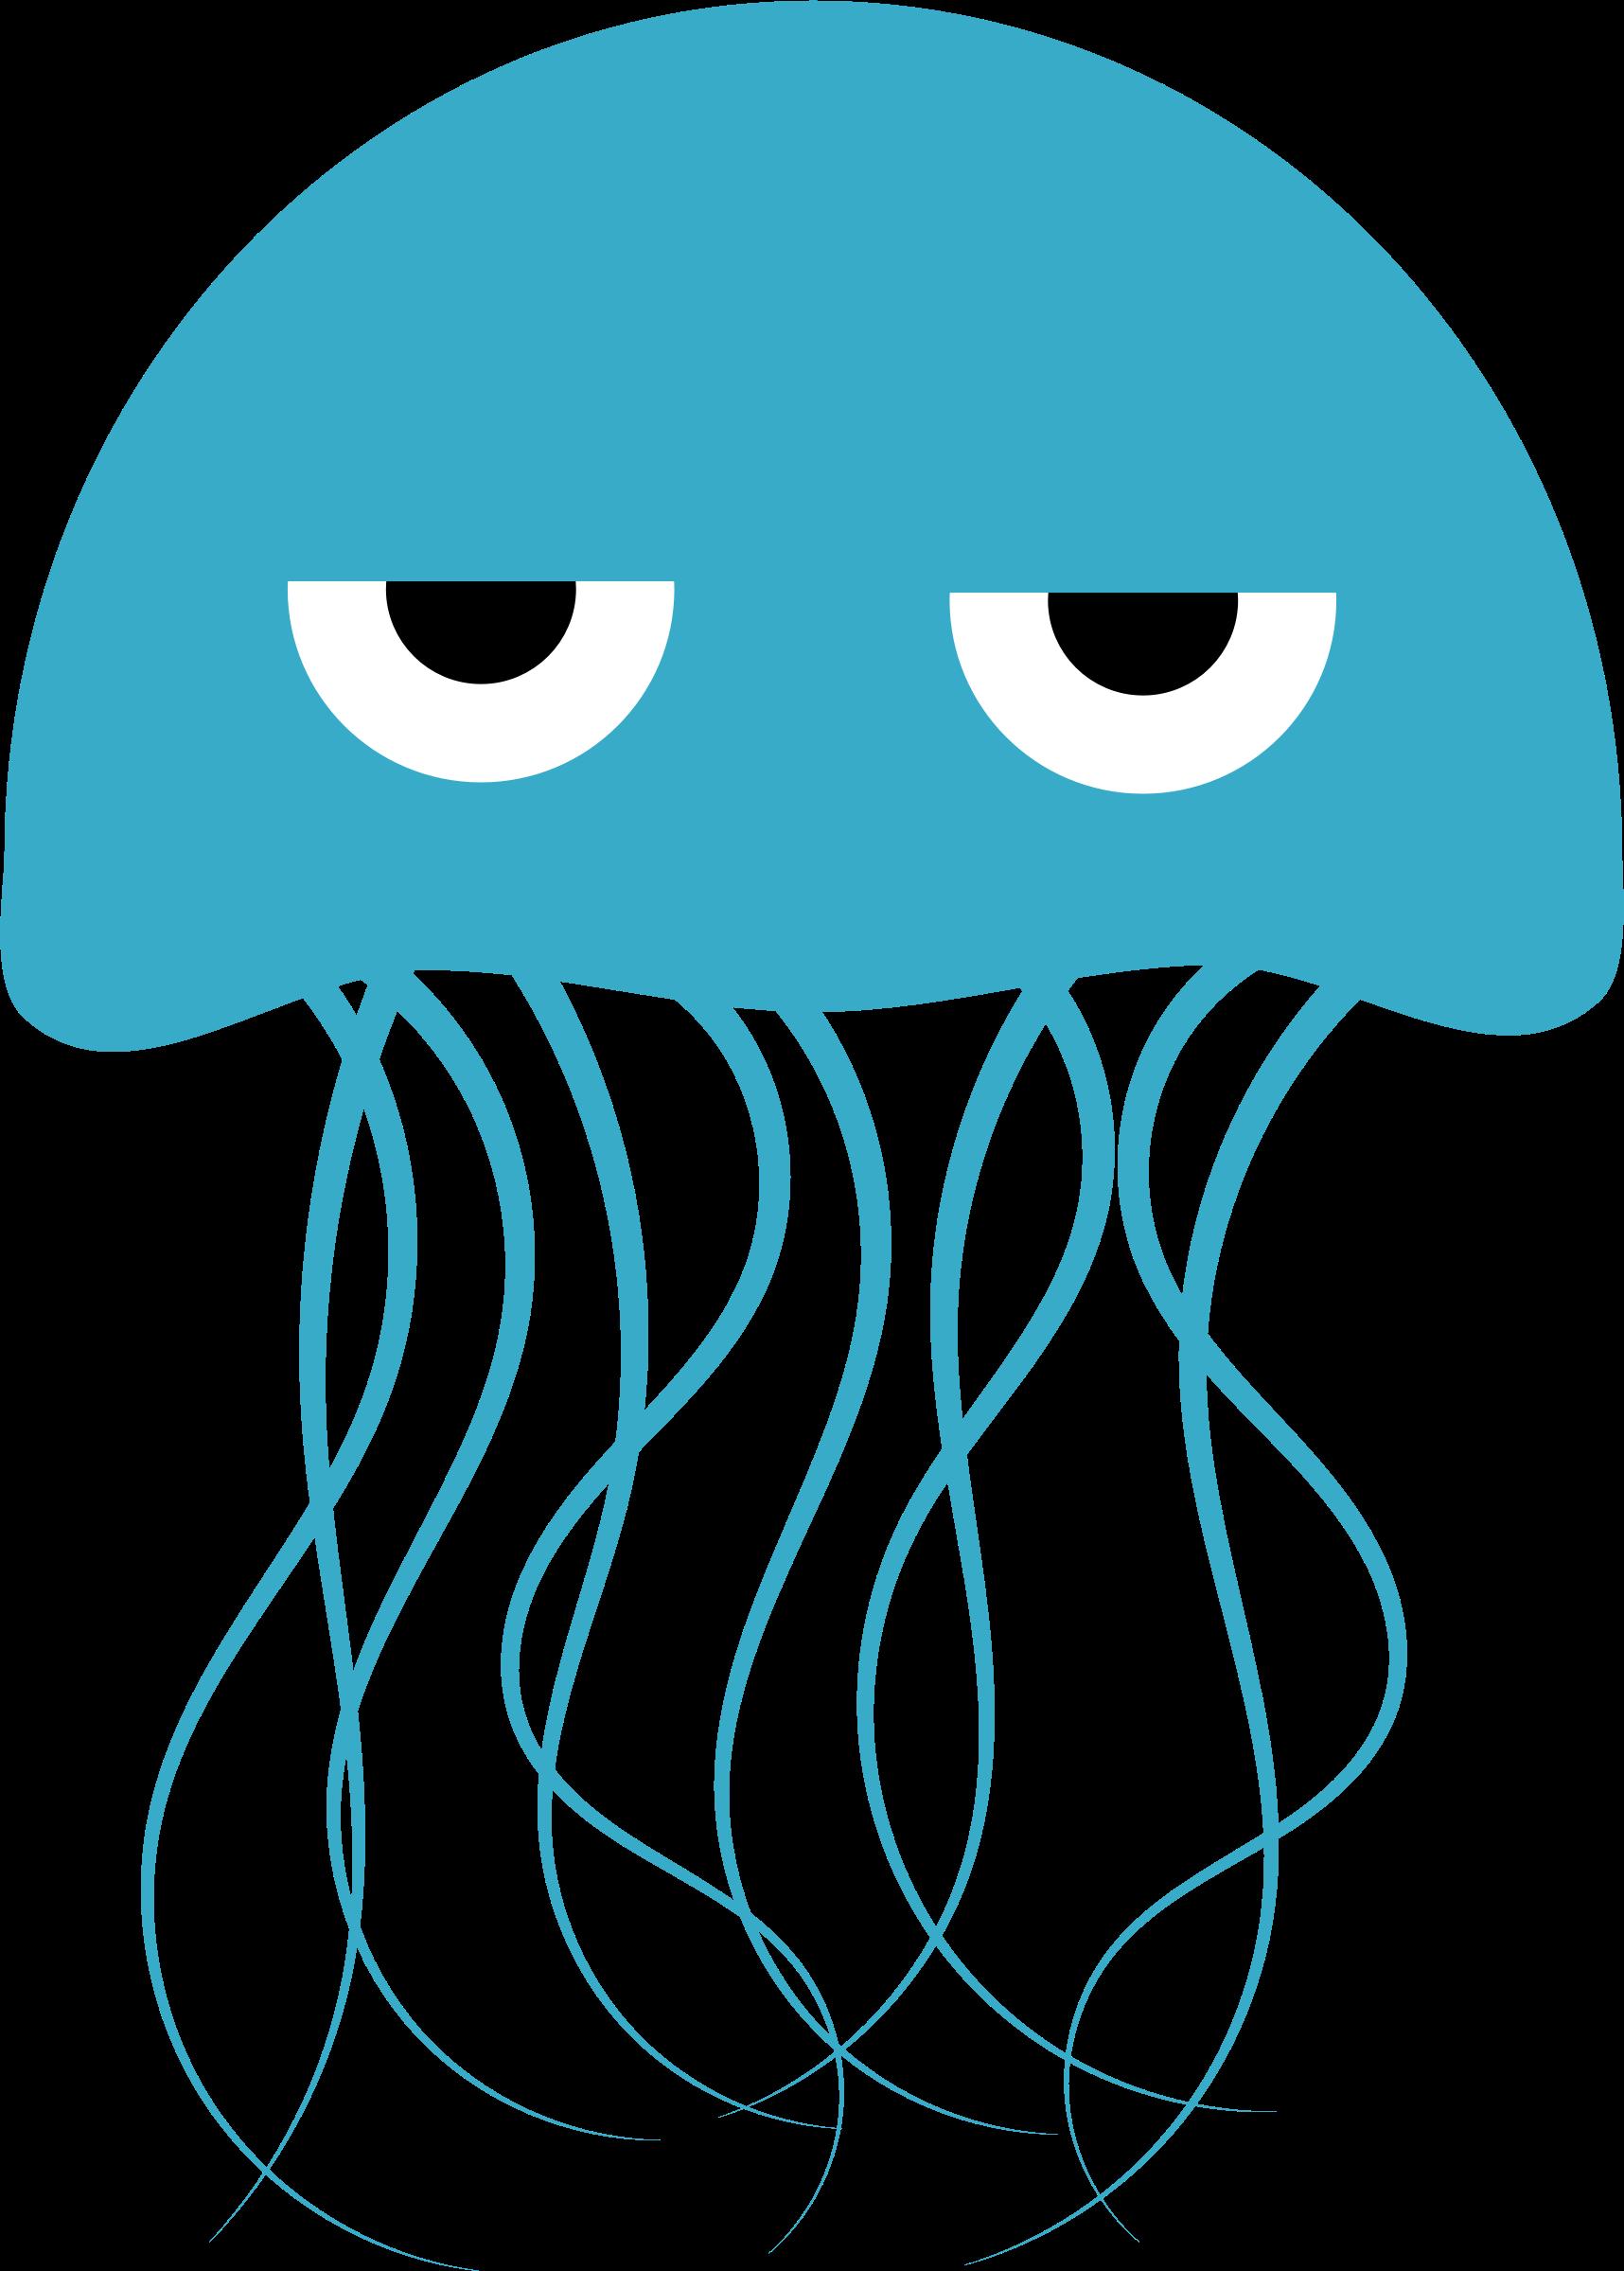 Blue Jellyfish Watercolor Painting Jellyfish Wall Art Etsy Jellyfish Wall Art Art Jellyfish Art